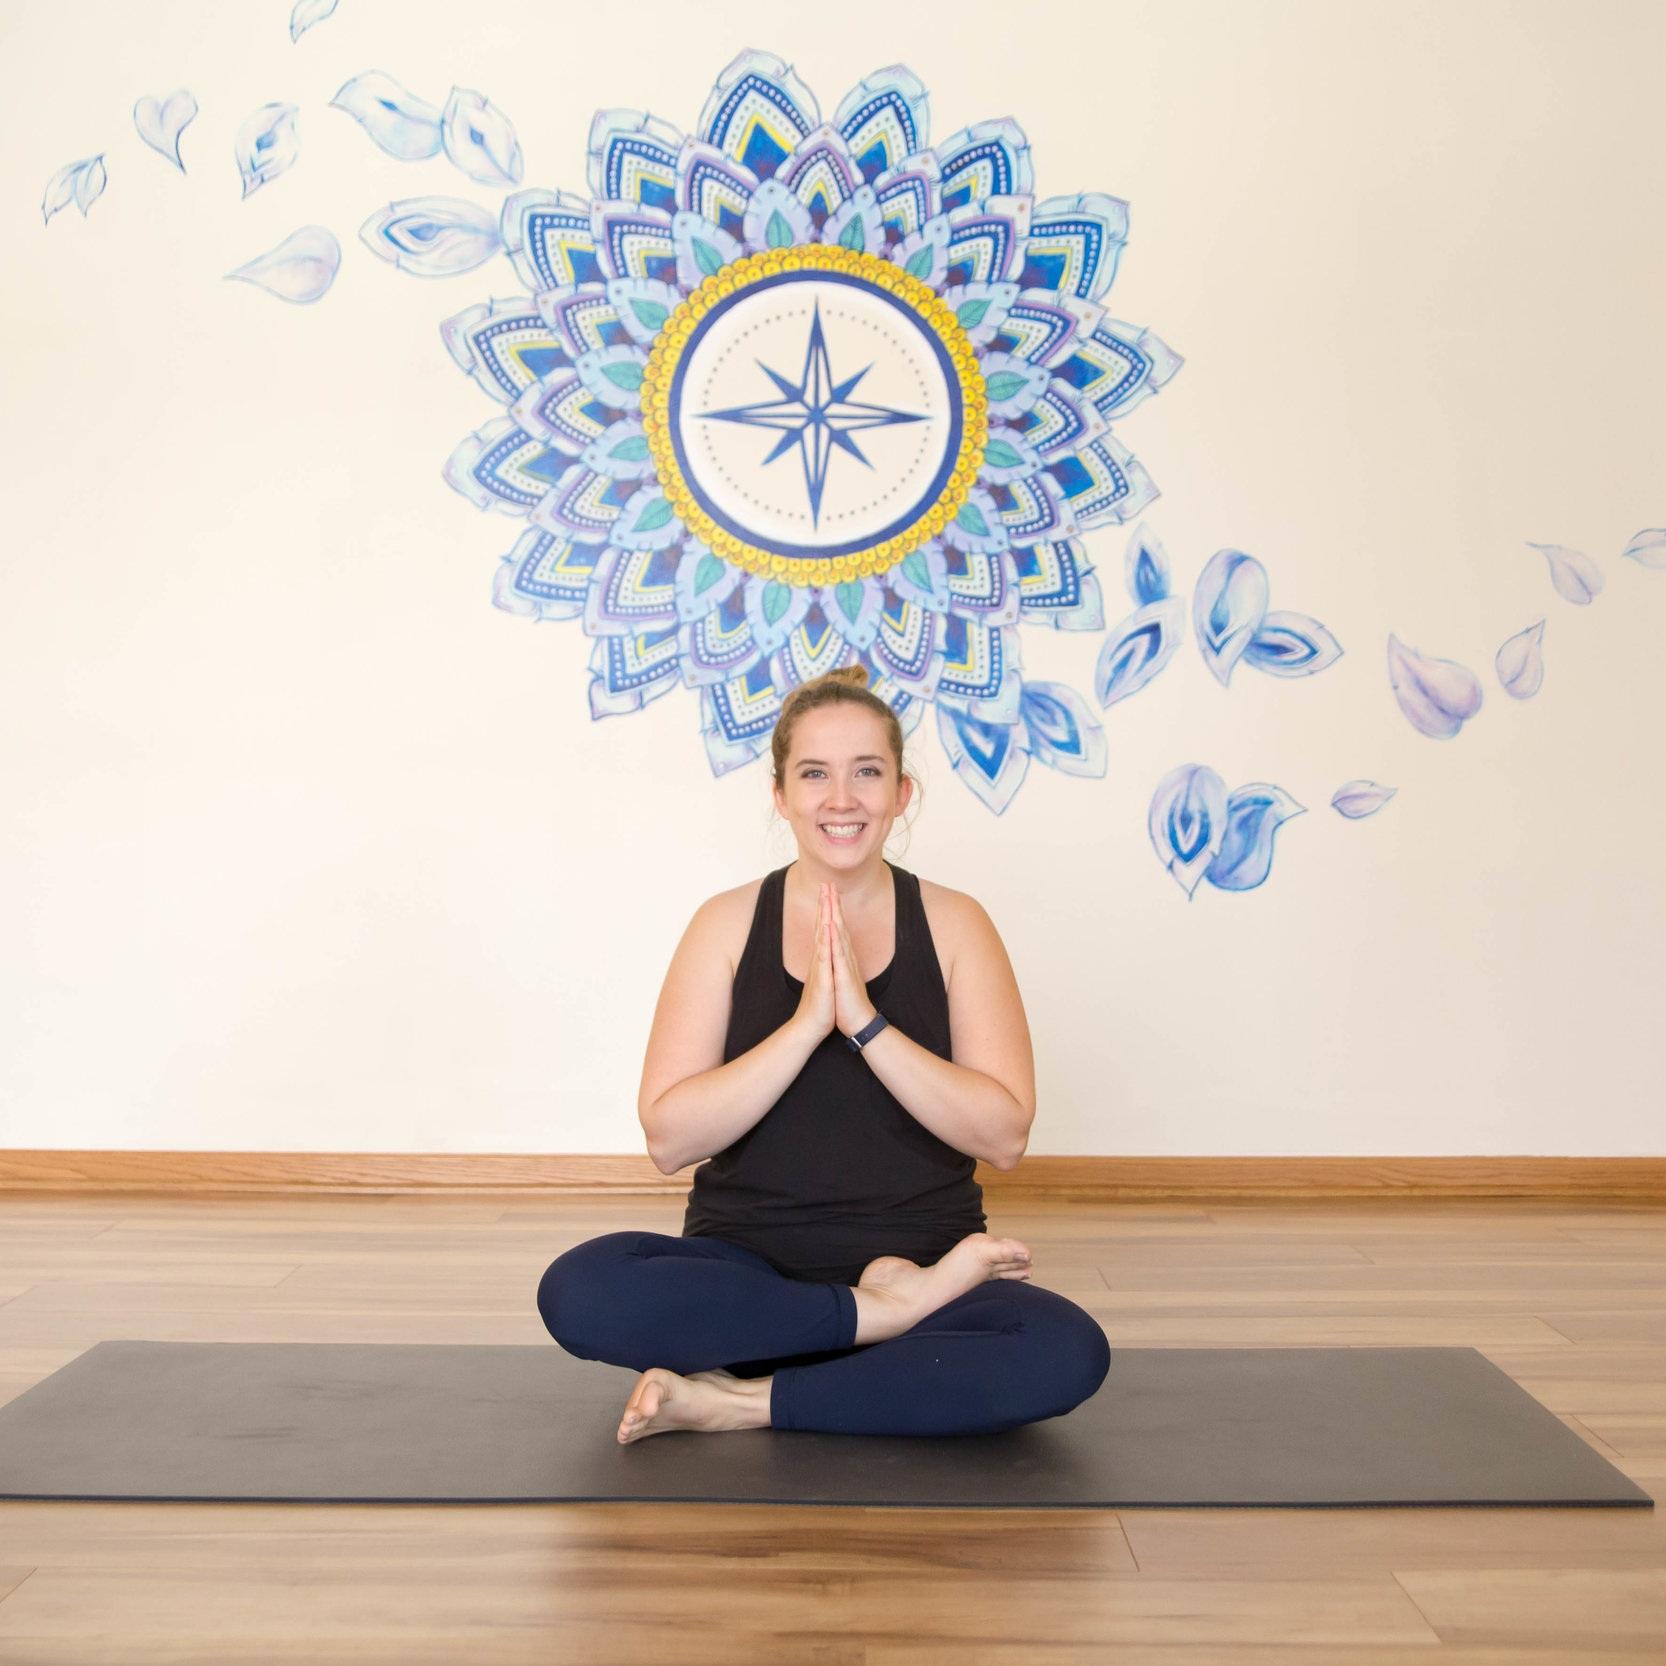 Lara lirely - School Director, Lead Trainer, Owner of Coda Yoga StudioExperienced-Registered Yoga Teacher 500 Hours (E-RYT 500)Yoga Alliance Continuing Education ProviderNCI Level 1 Certified Nutrition Coach